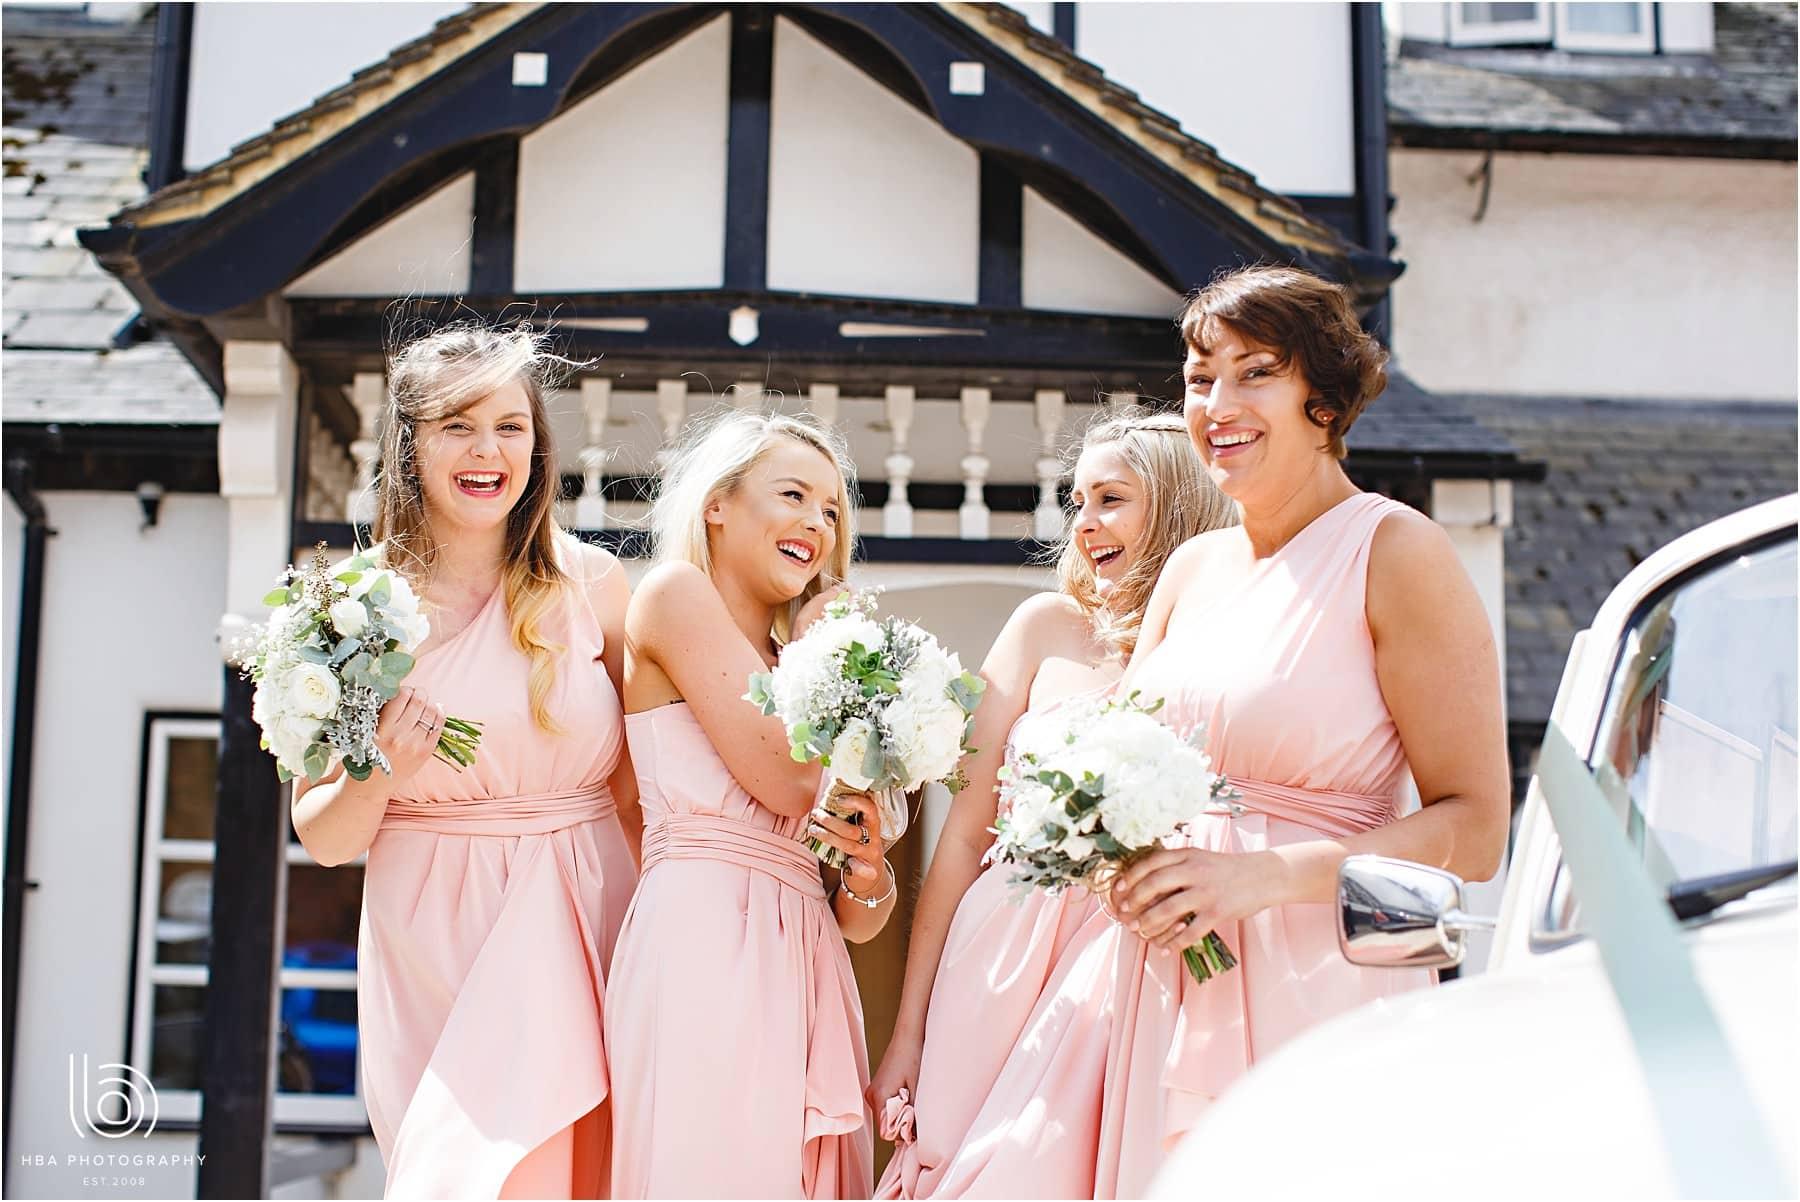 the bridesmaids waiting